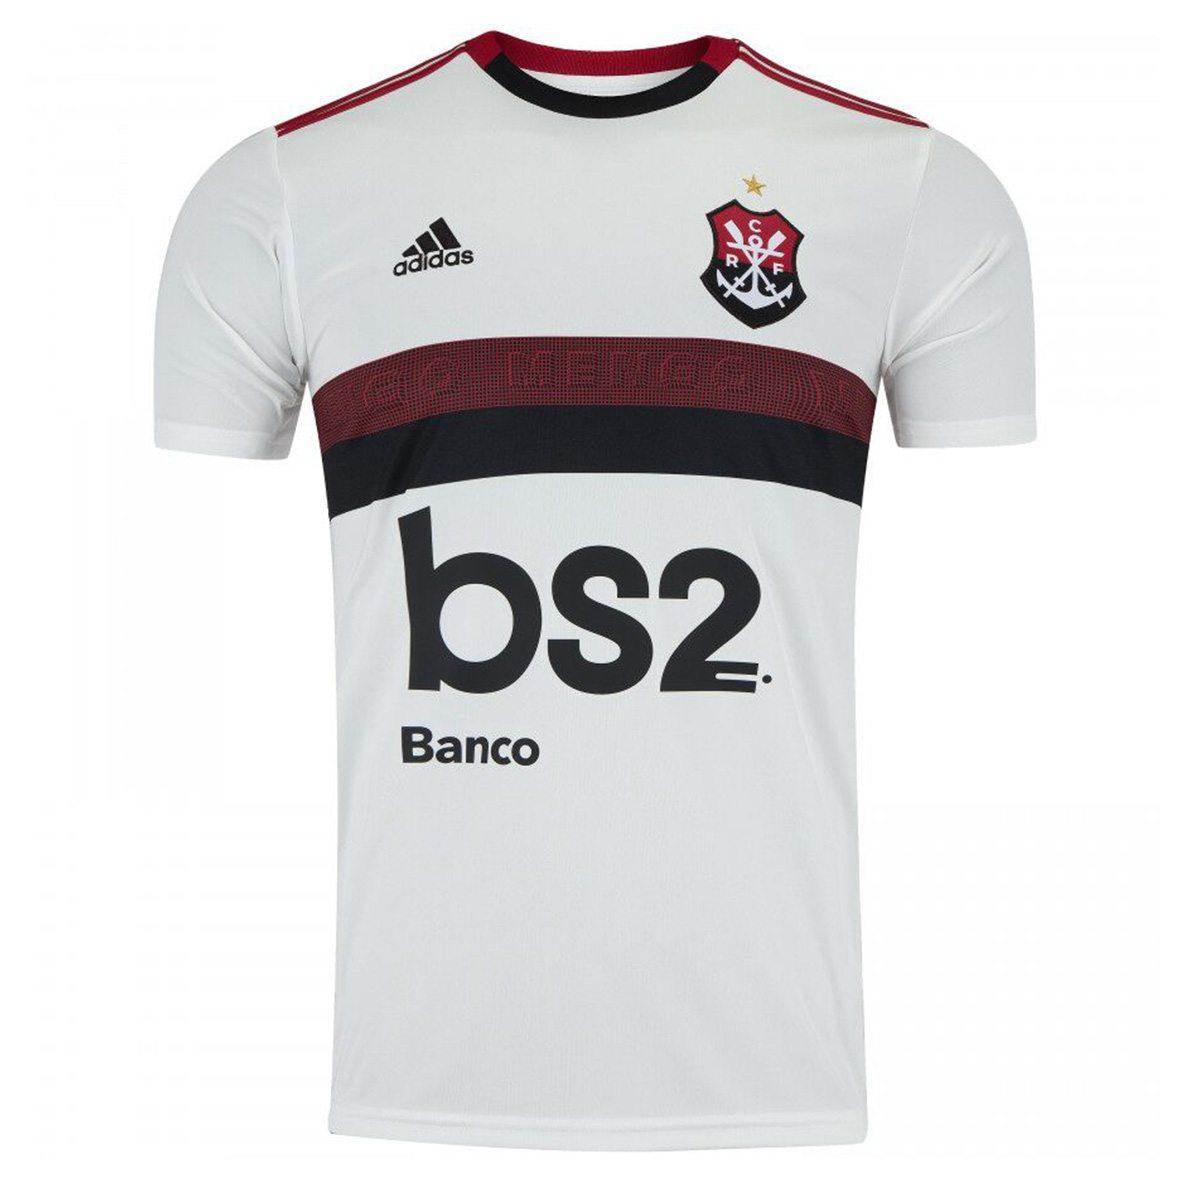 Camisa Flamengo II 19/20 s/nº Torcedor Adidas Masculina